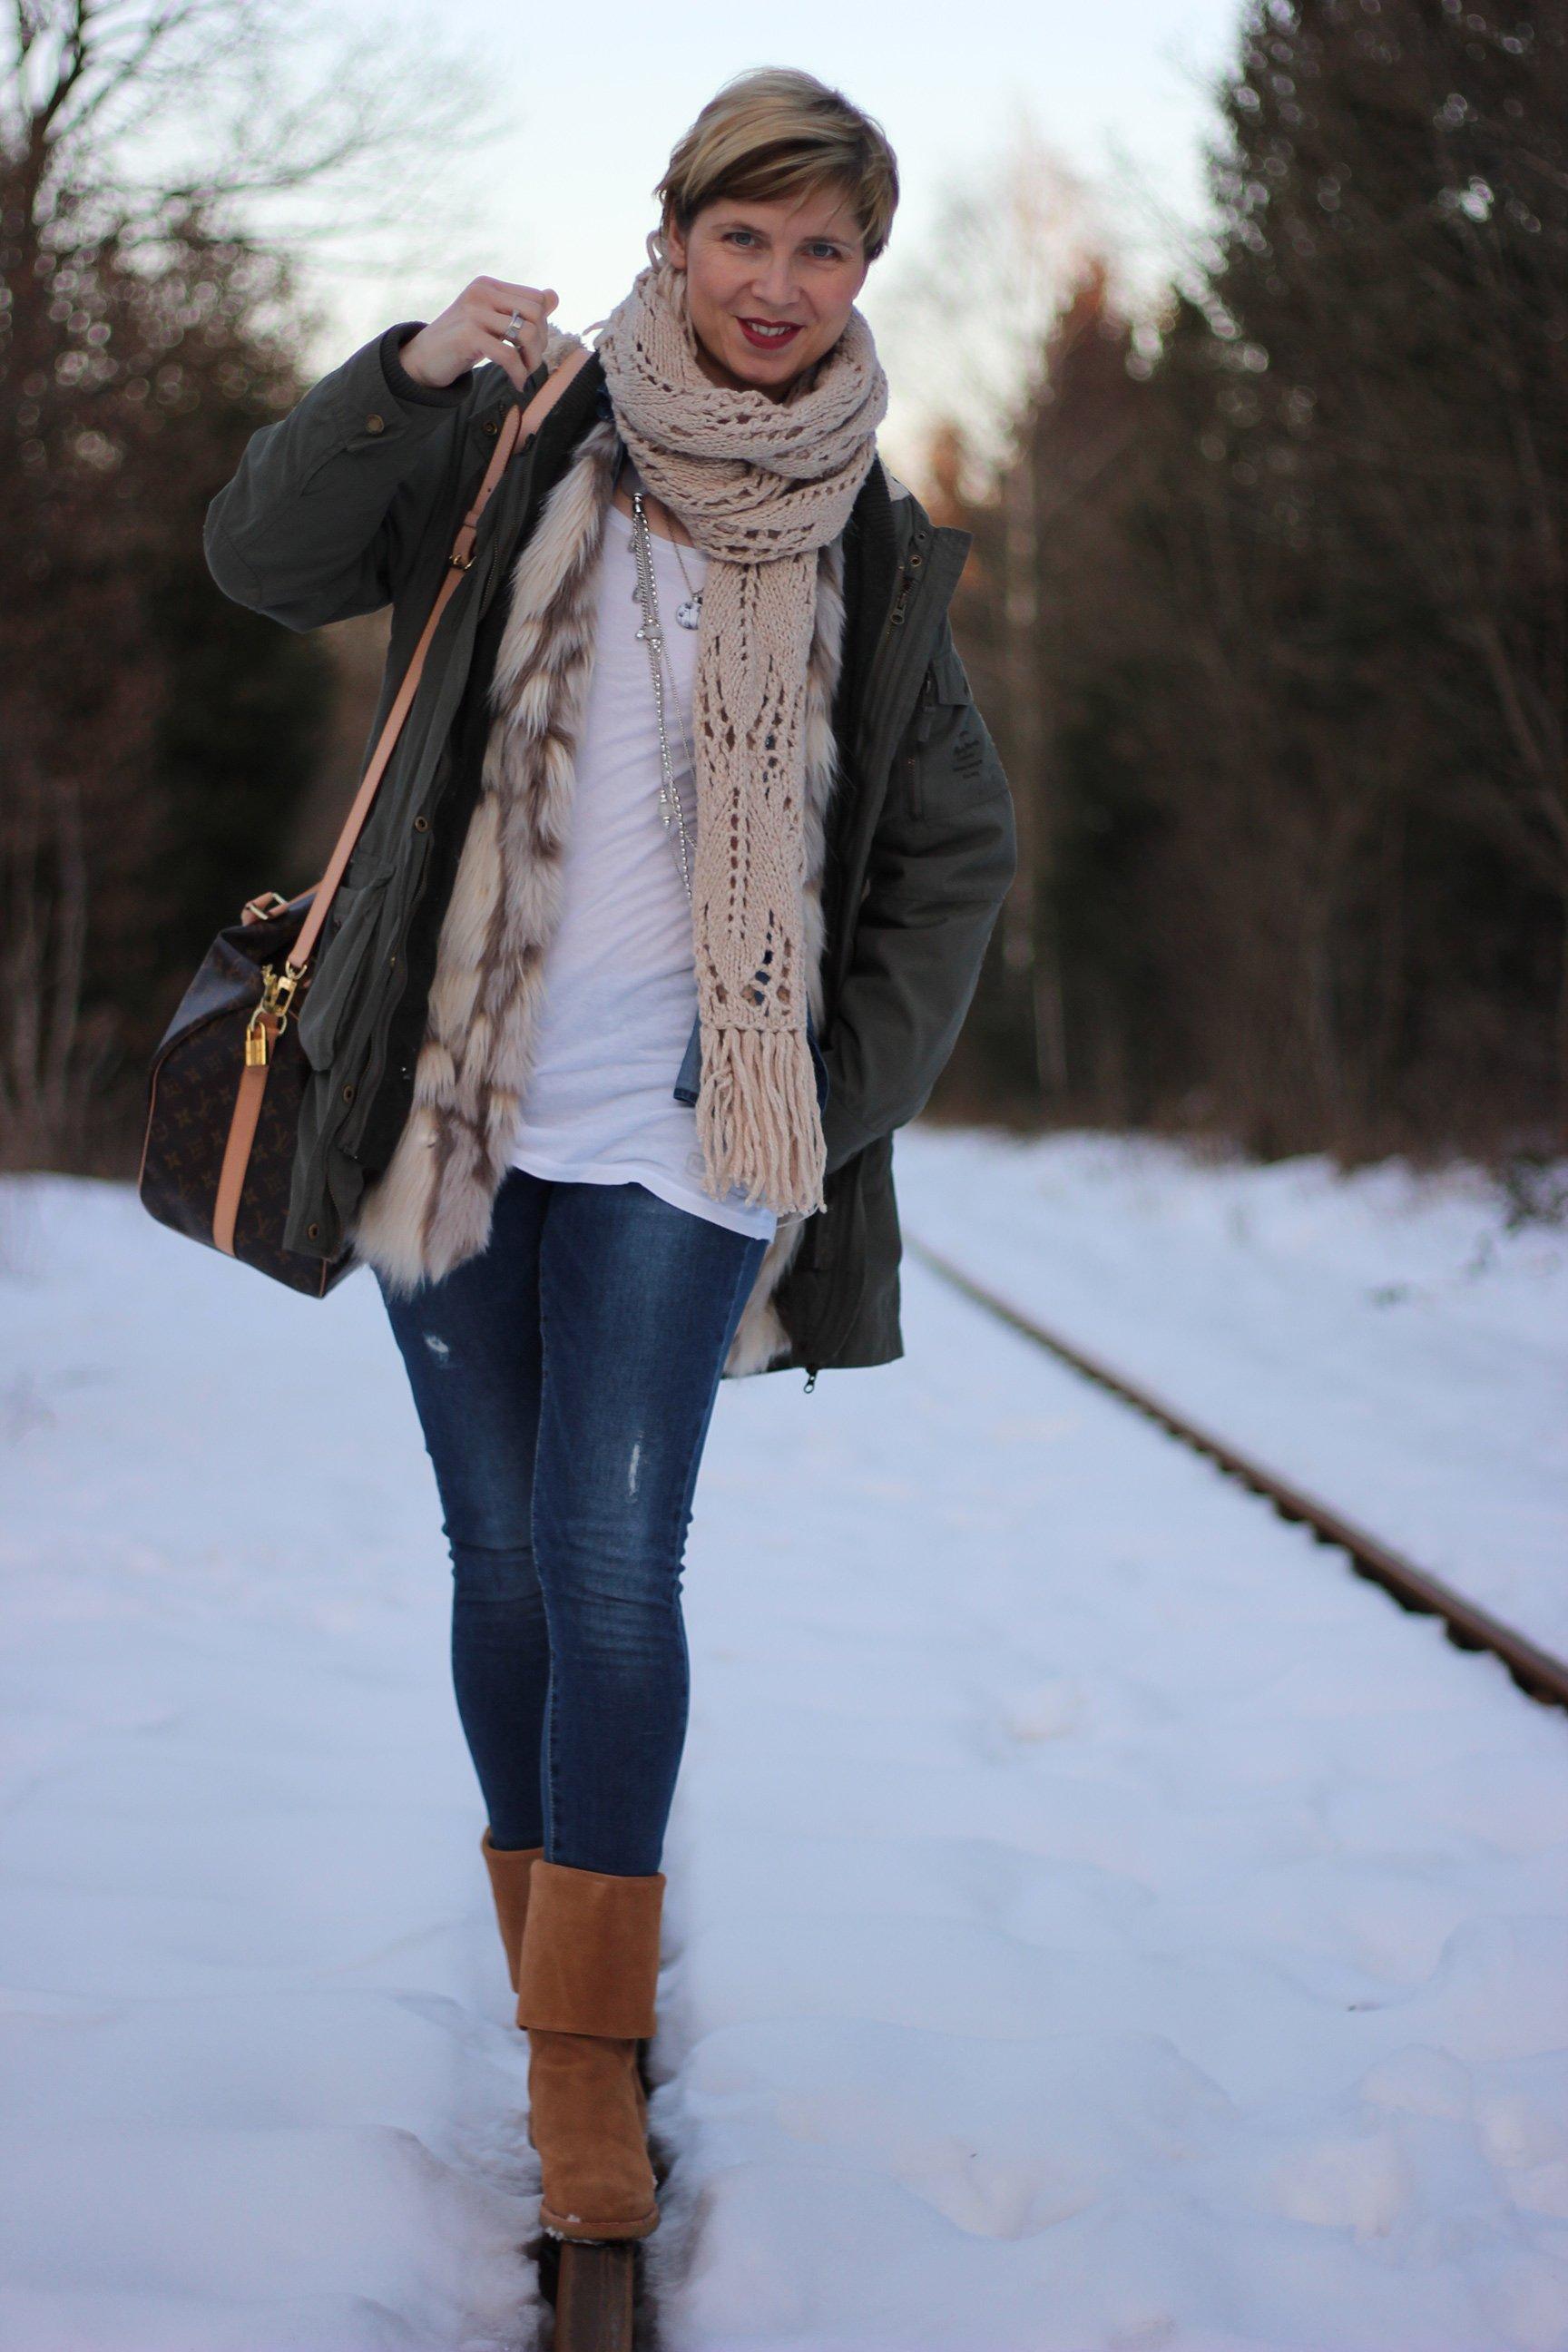 IMG_9898a_OnlyJeans_FakeFurCream_MarcoPolo_UGGs_Winter